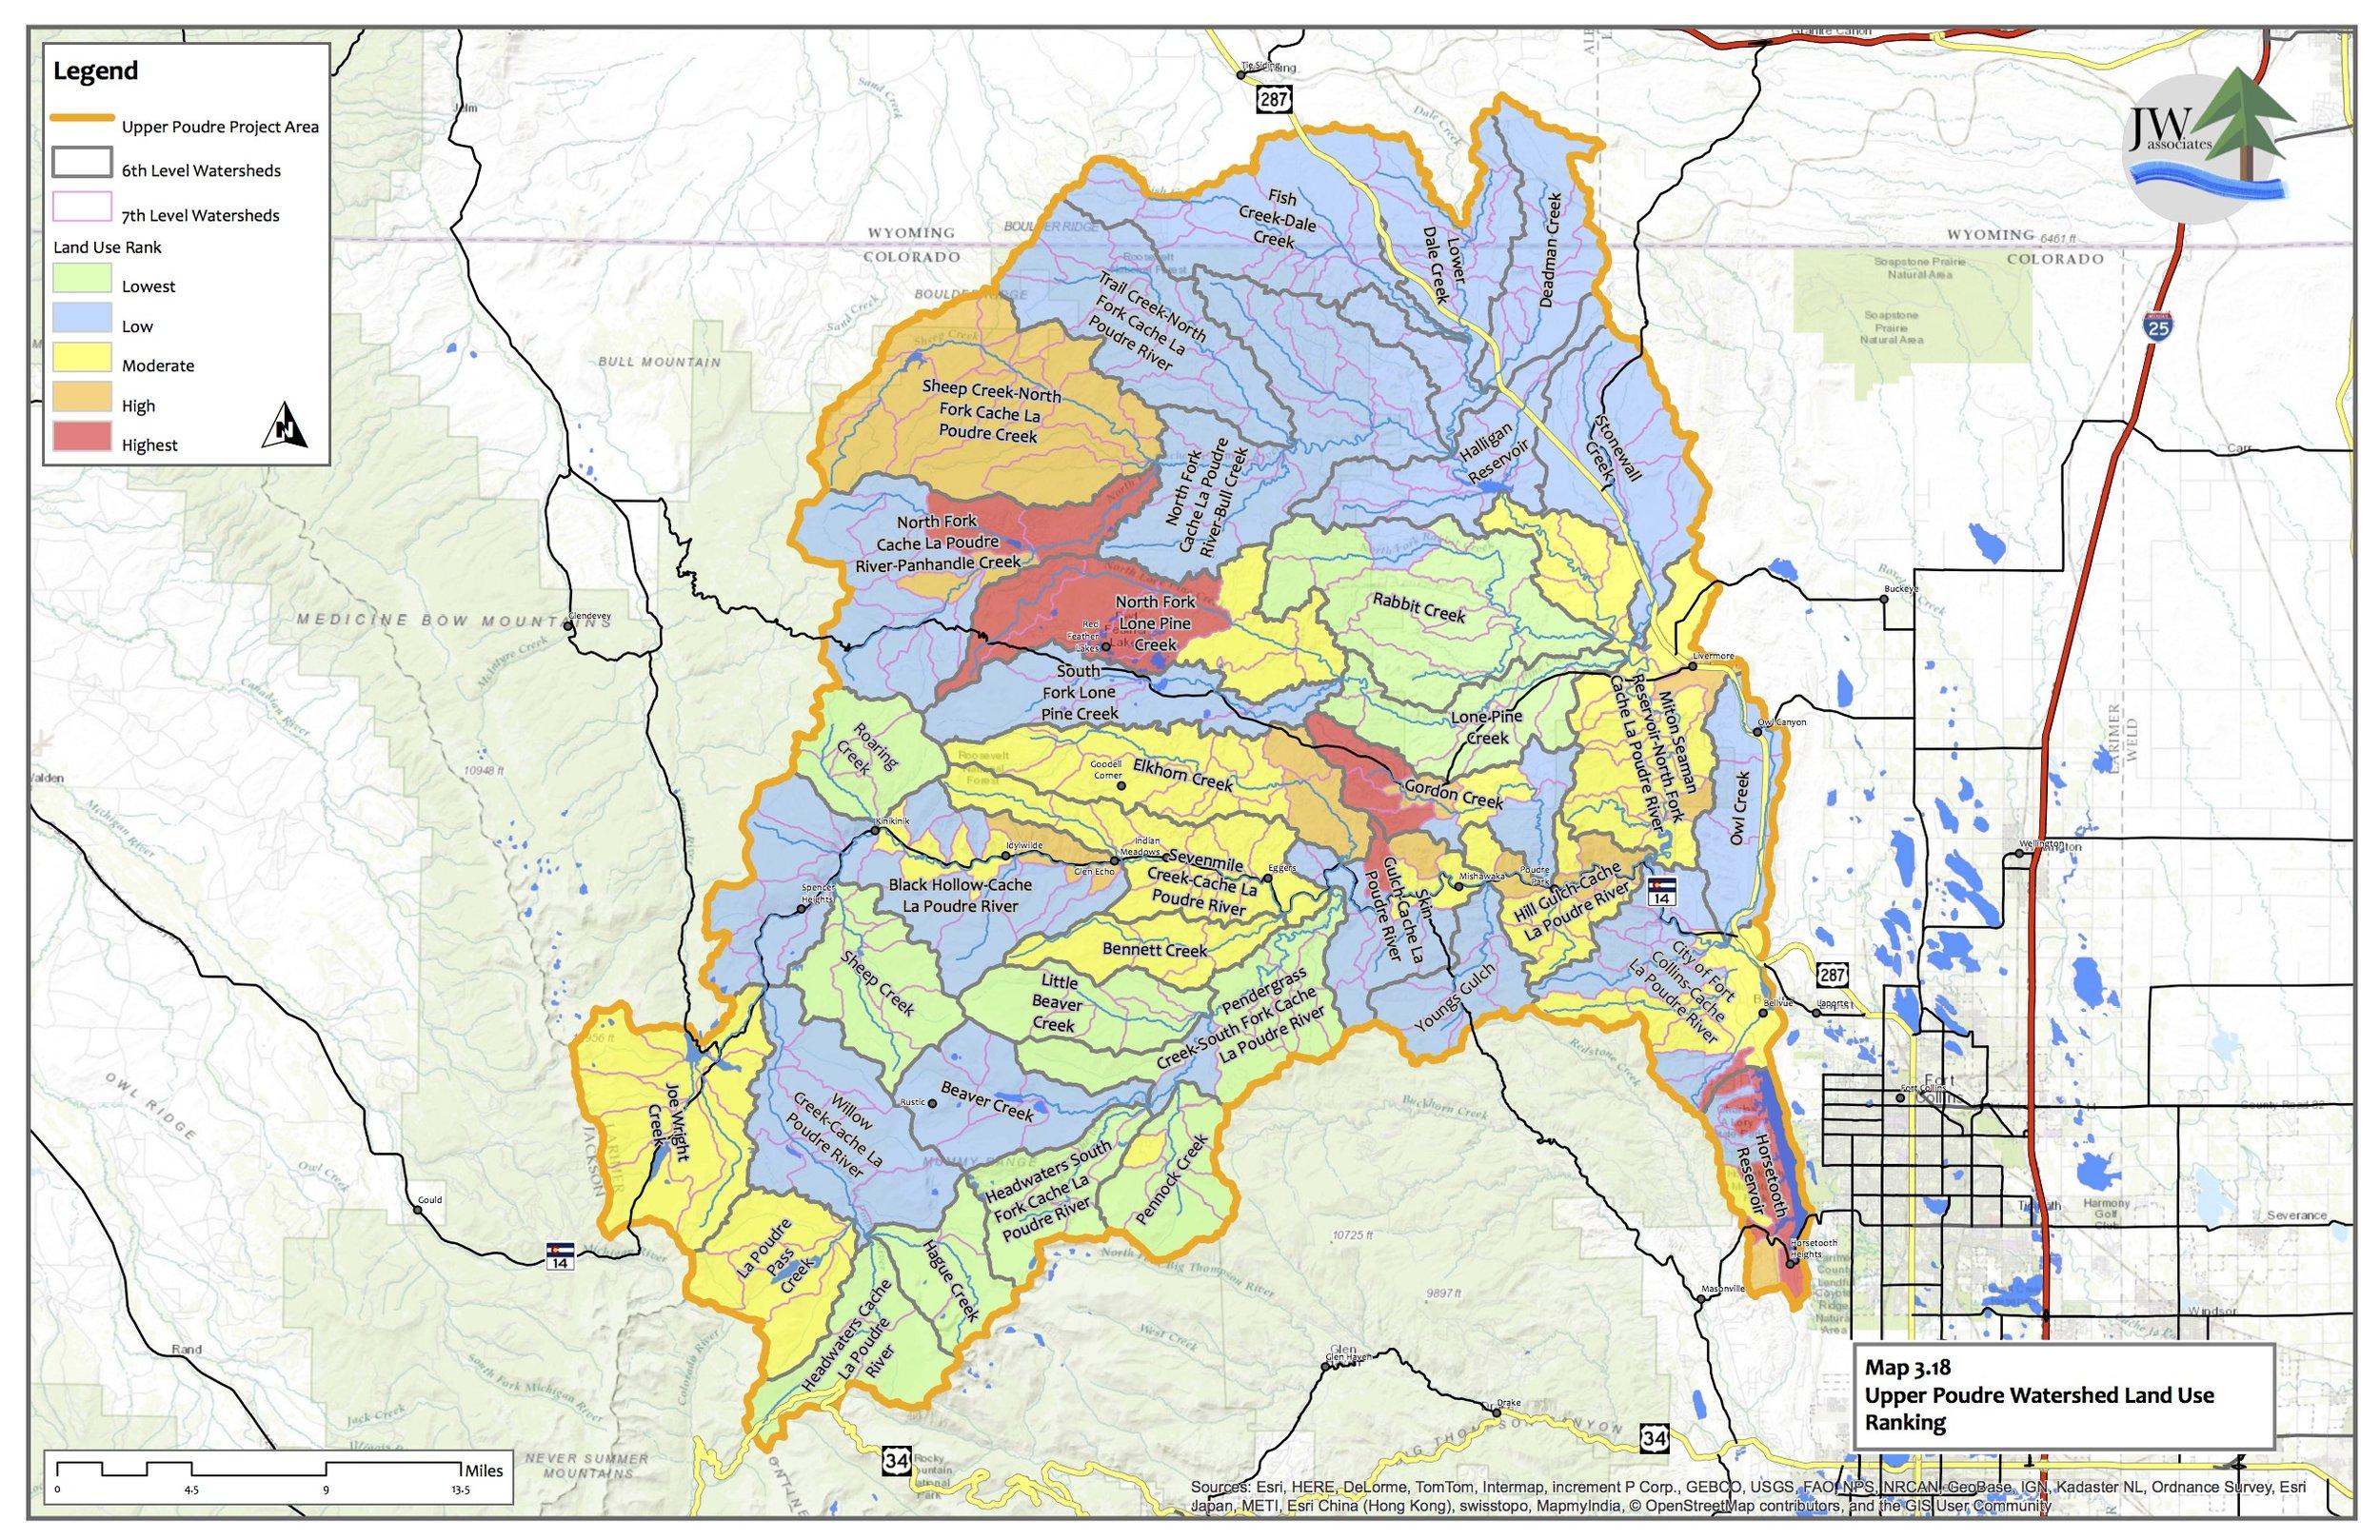 Map 3.18 UP_Landuse_Rank.jpg